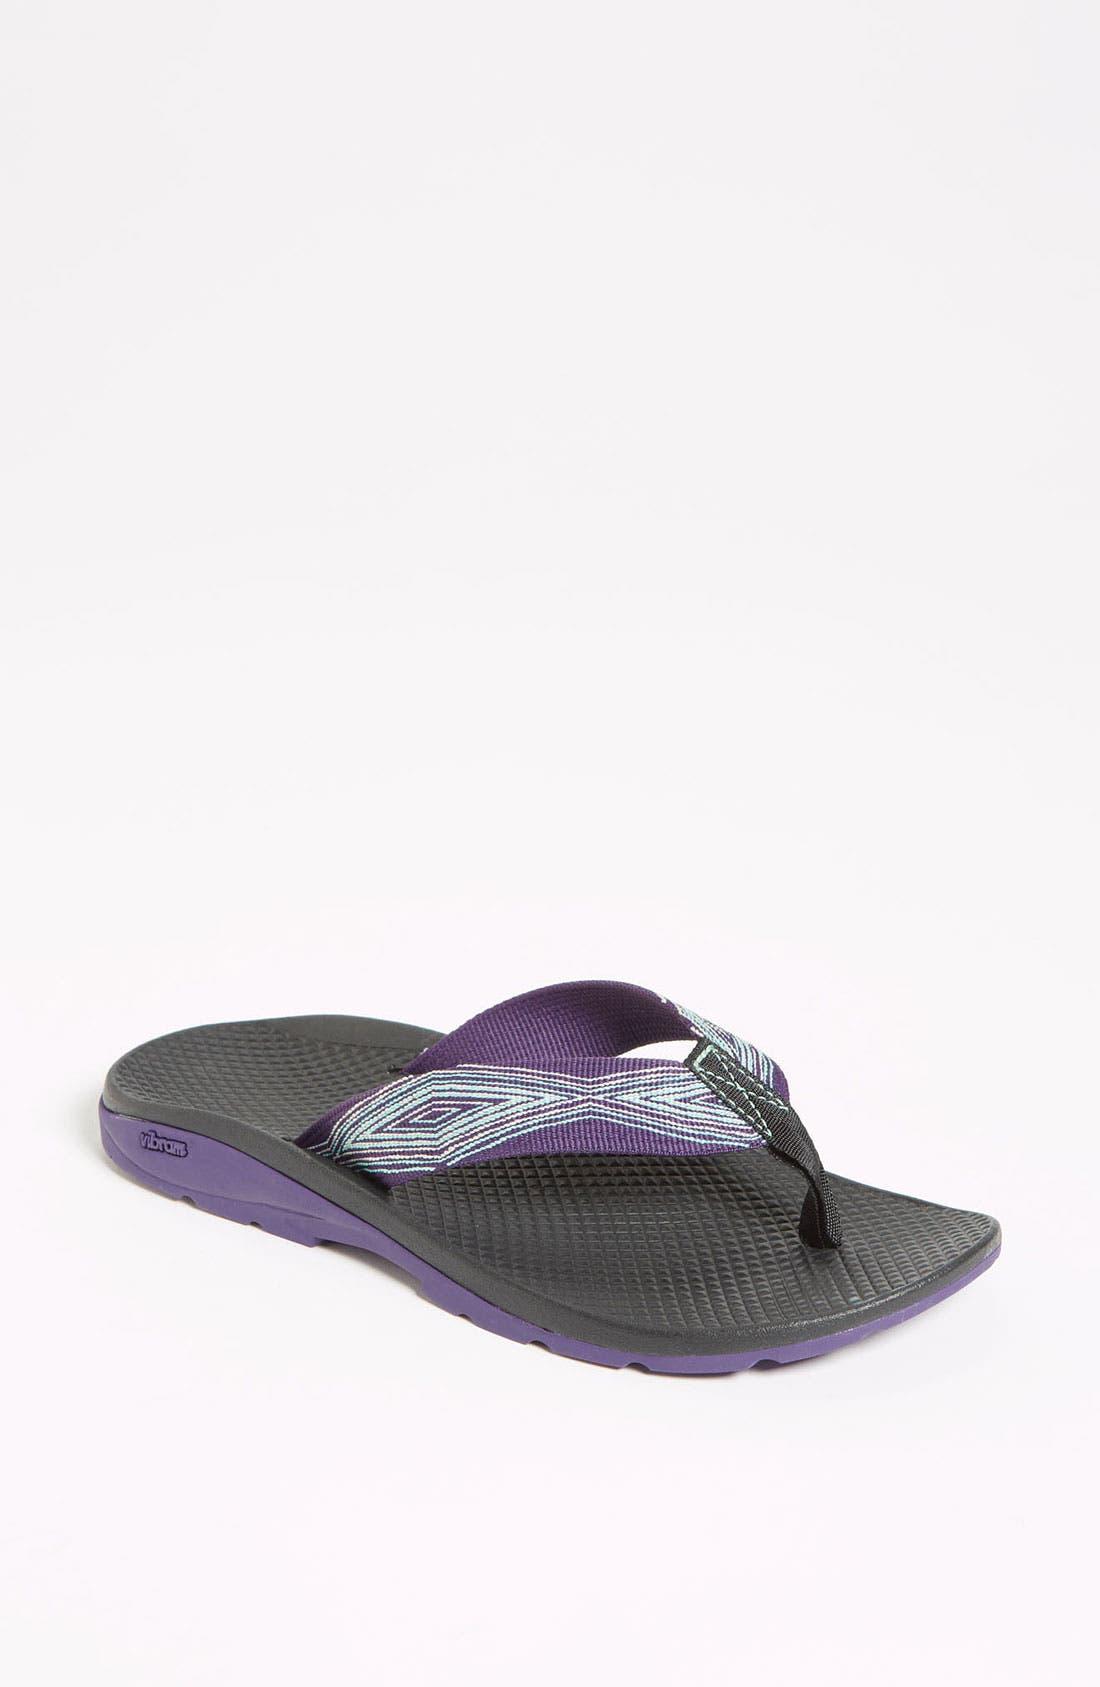 Main Image - Chaco 'Flip Vibe' Sandal